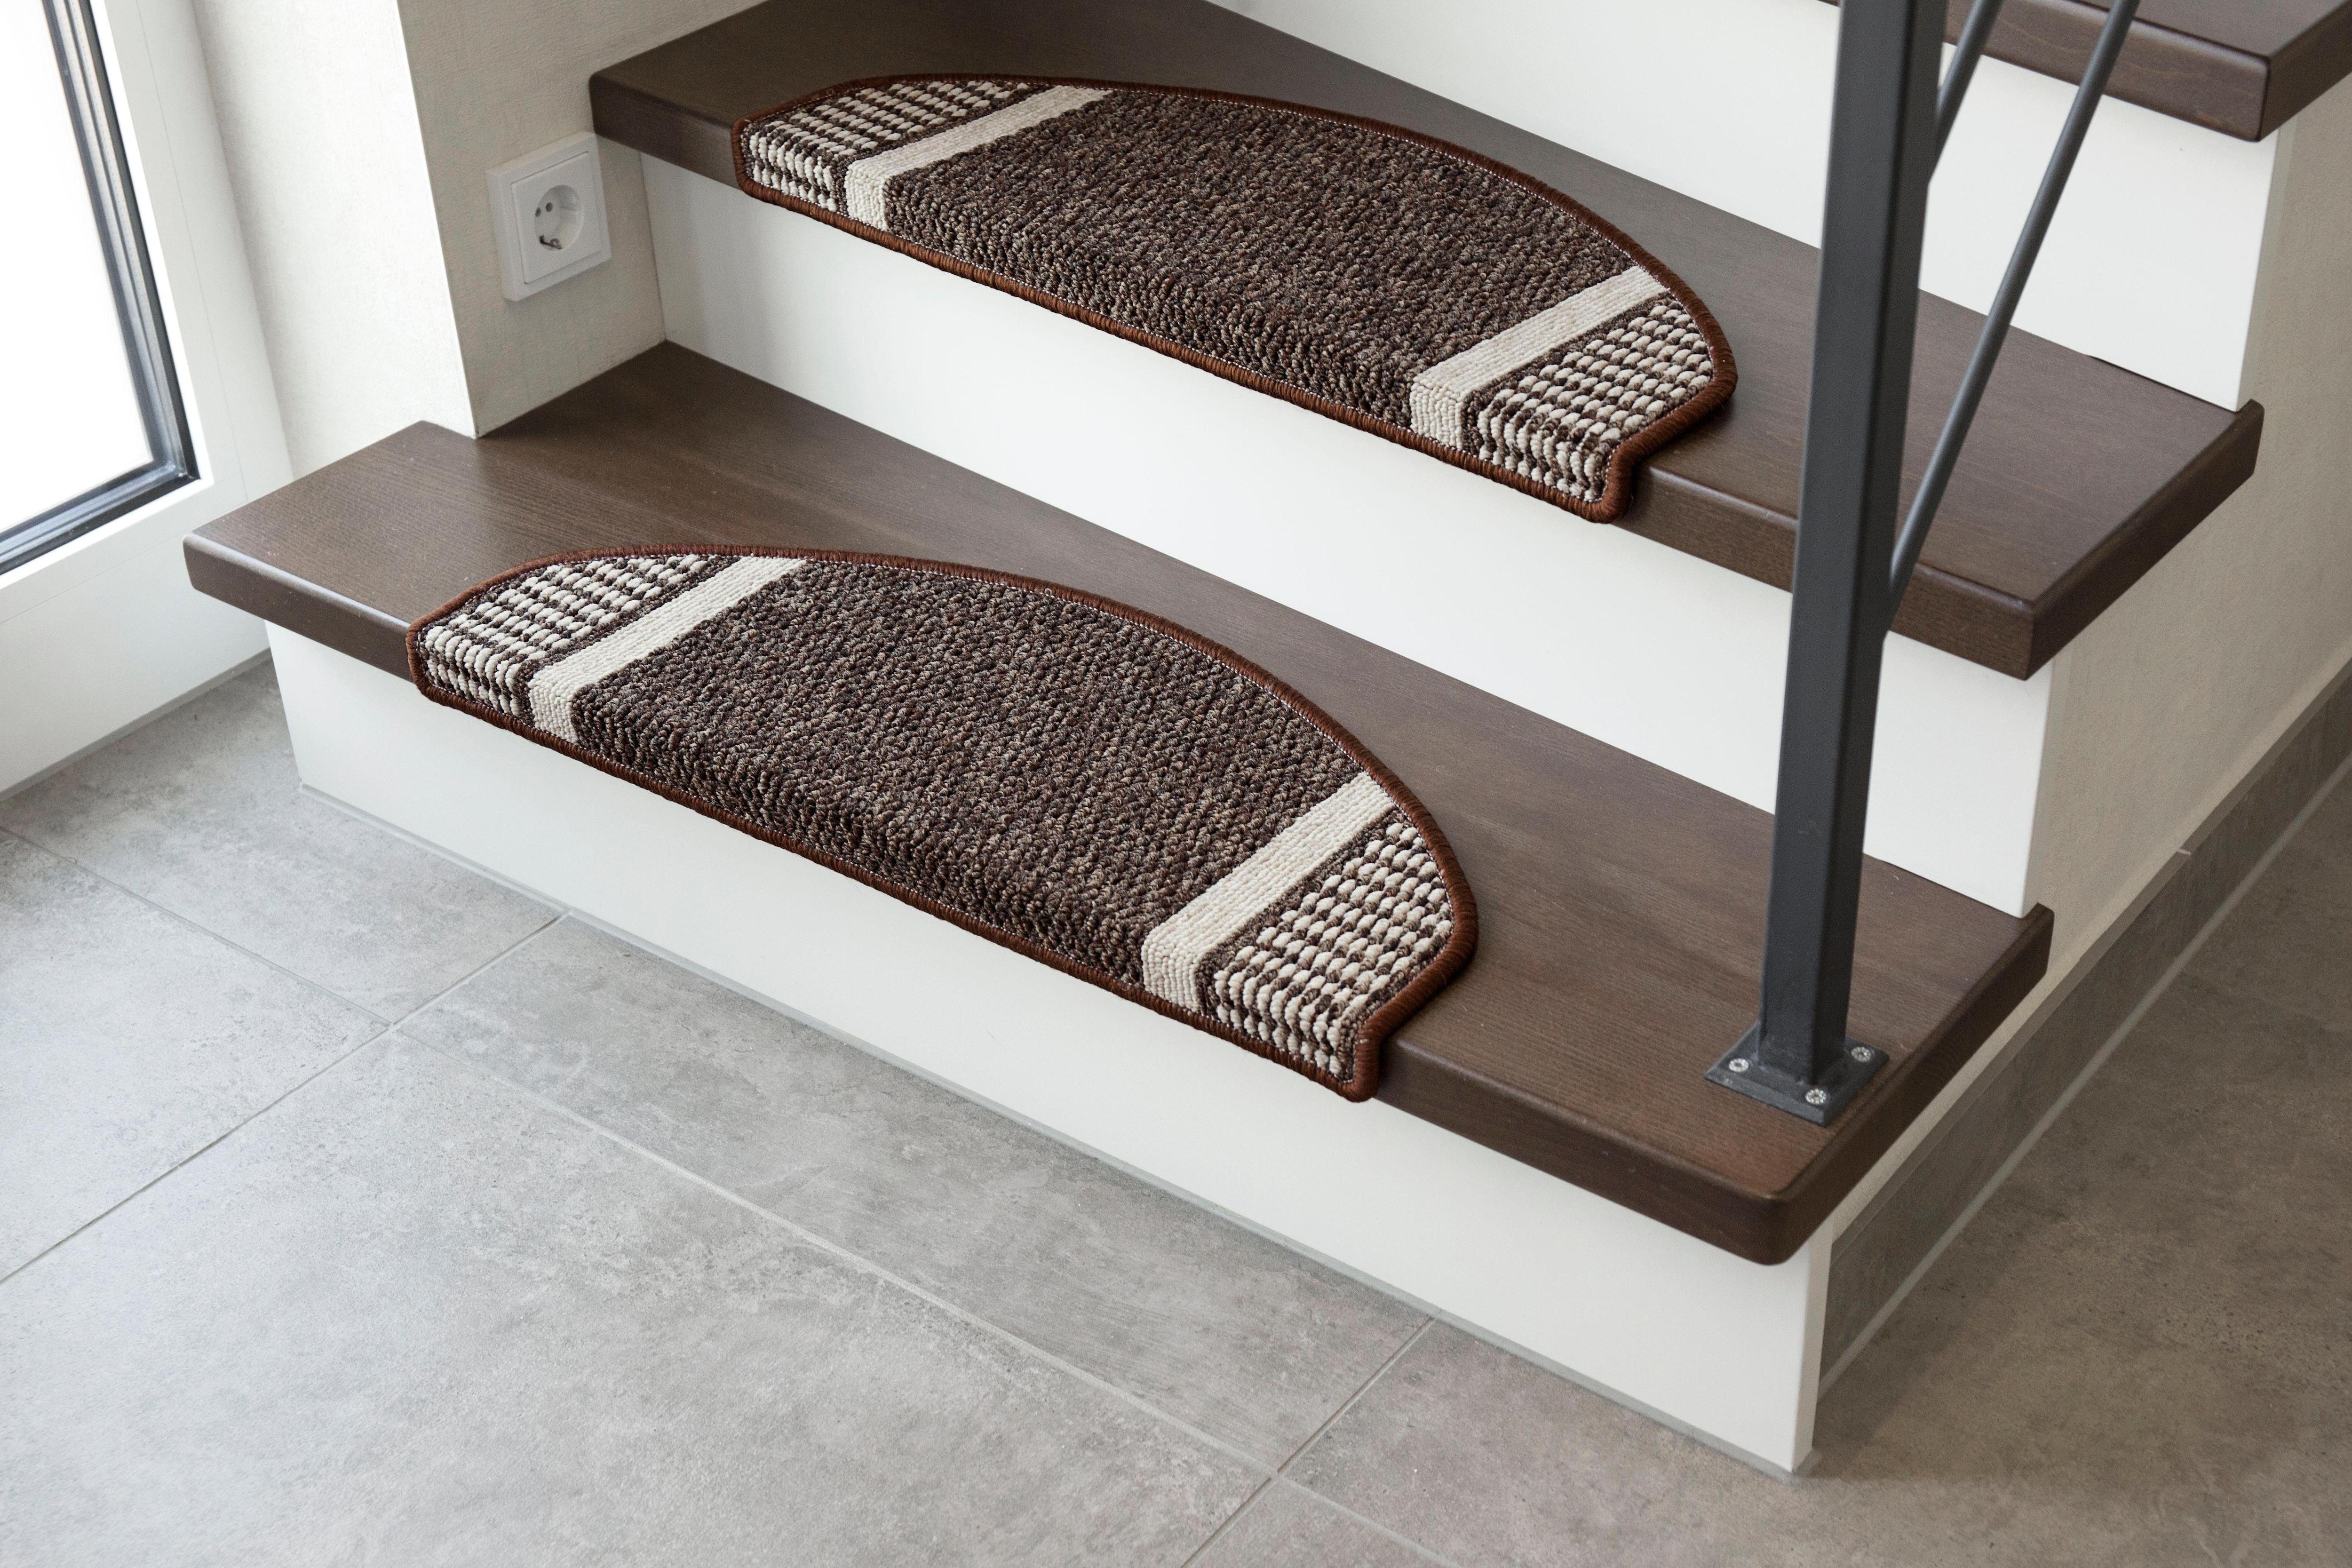 Stufenmatte Runner Andiamo stufenförmig Höhe 9 mm maschinell getuftet